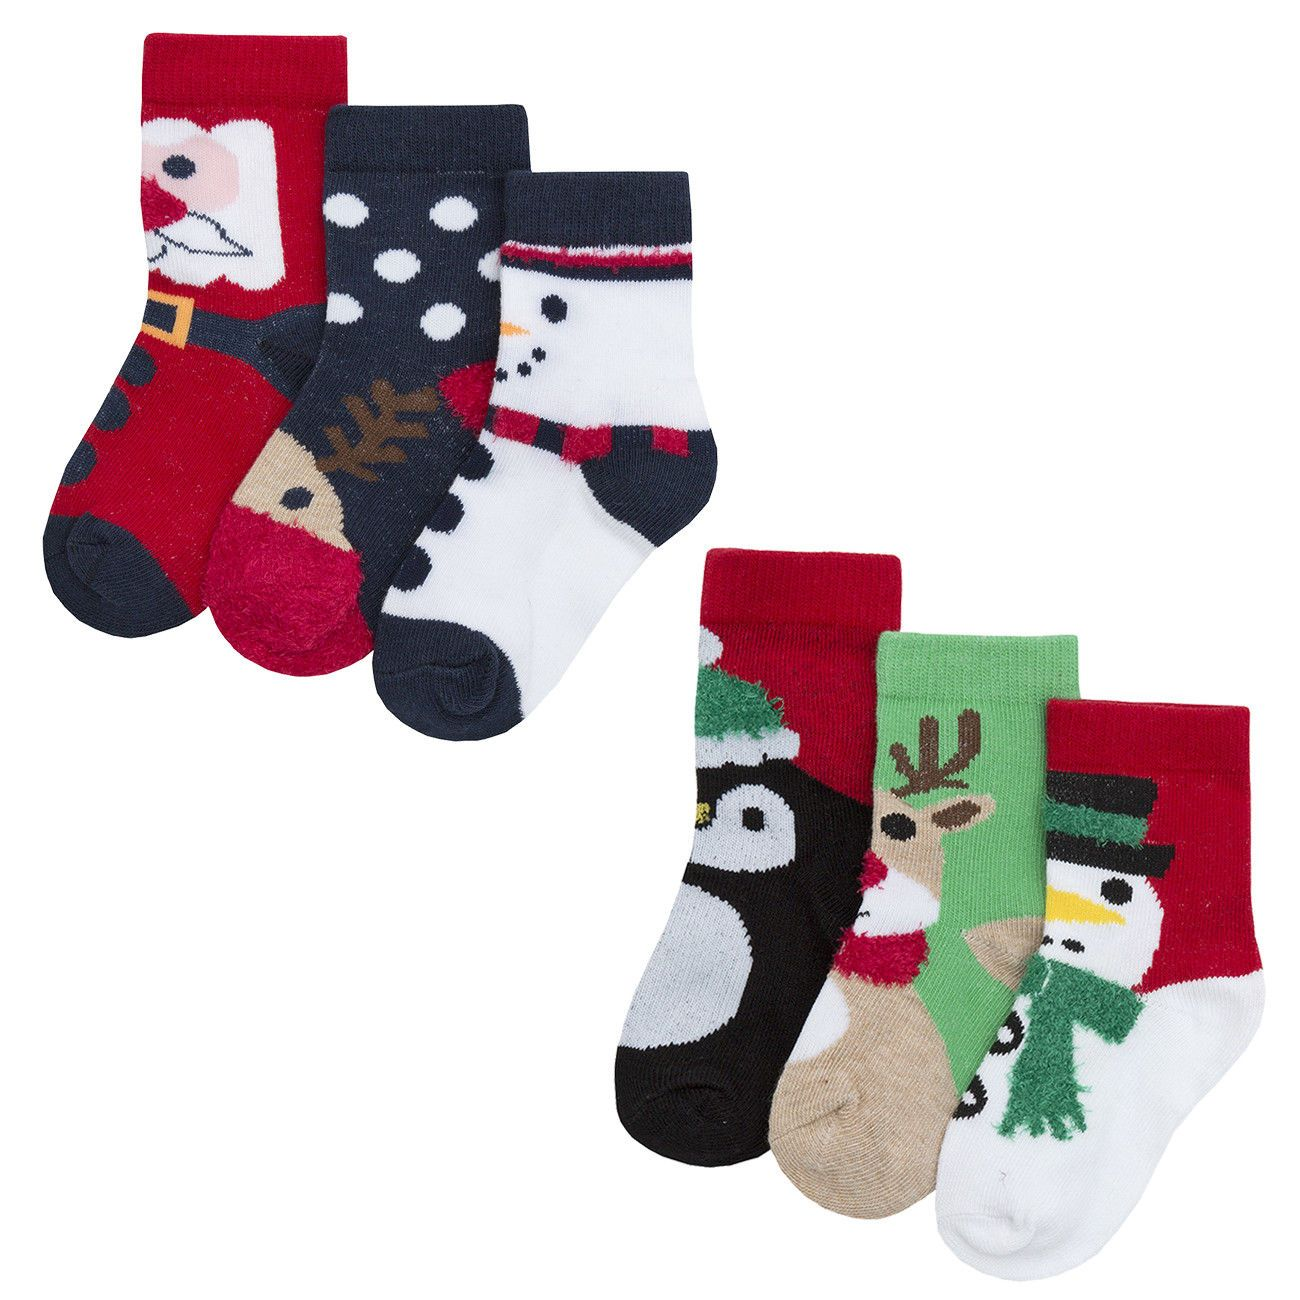 Babies Baby Boys Girls Novelty Christmas Socks Stocking Filler Cotton Rich Xmas